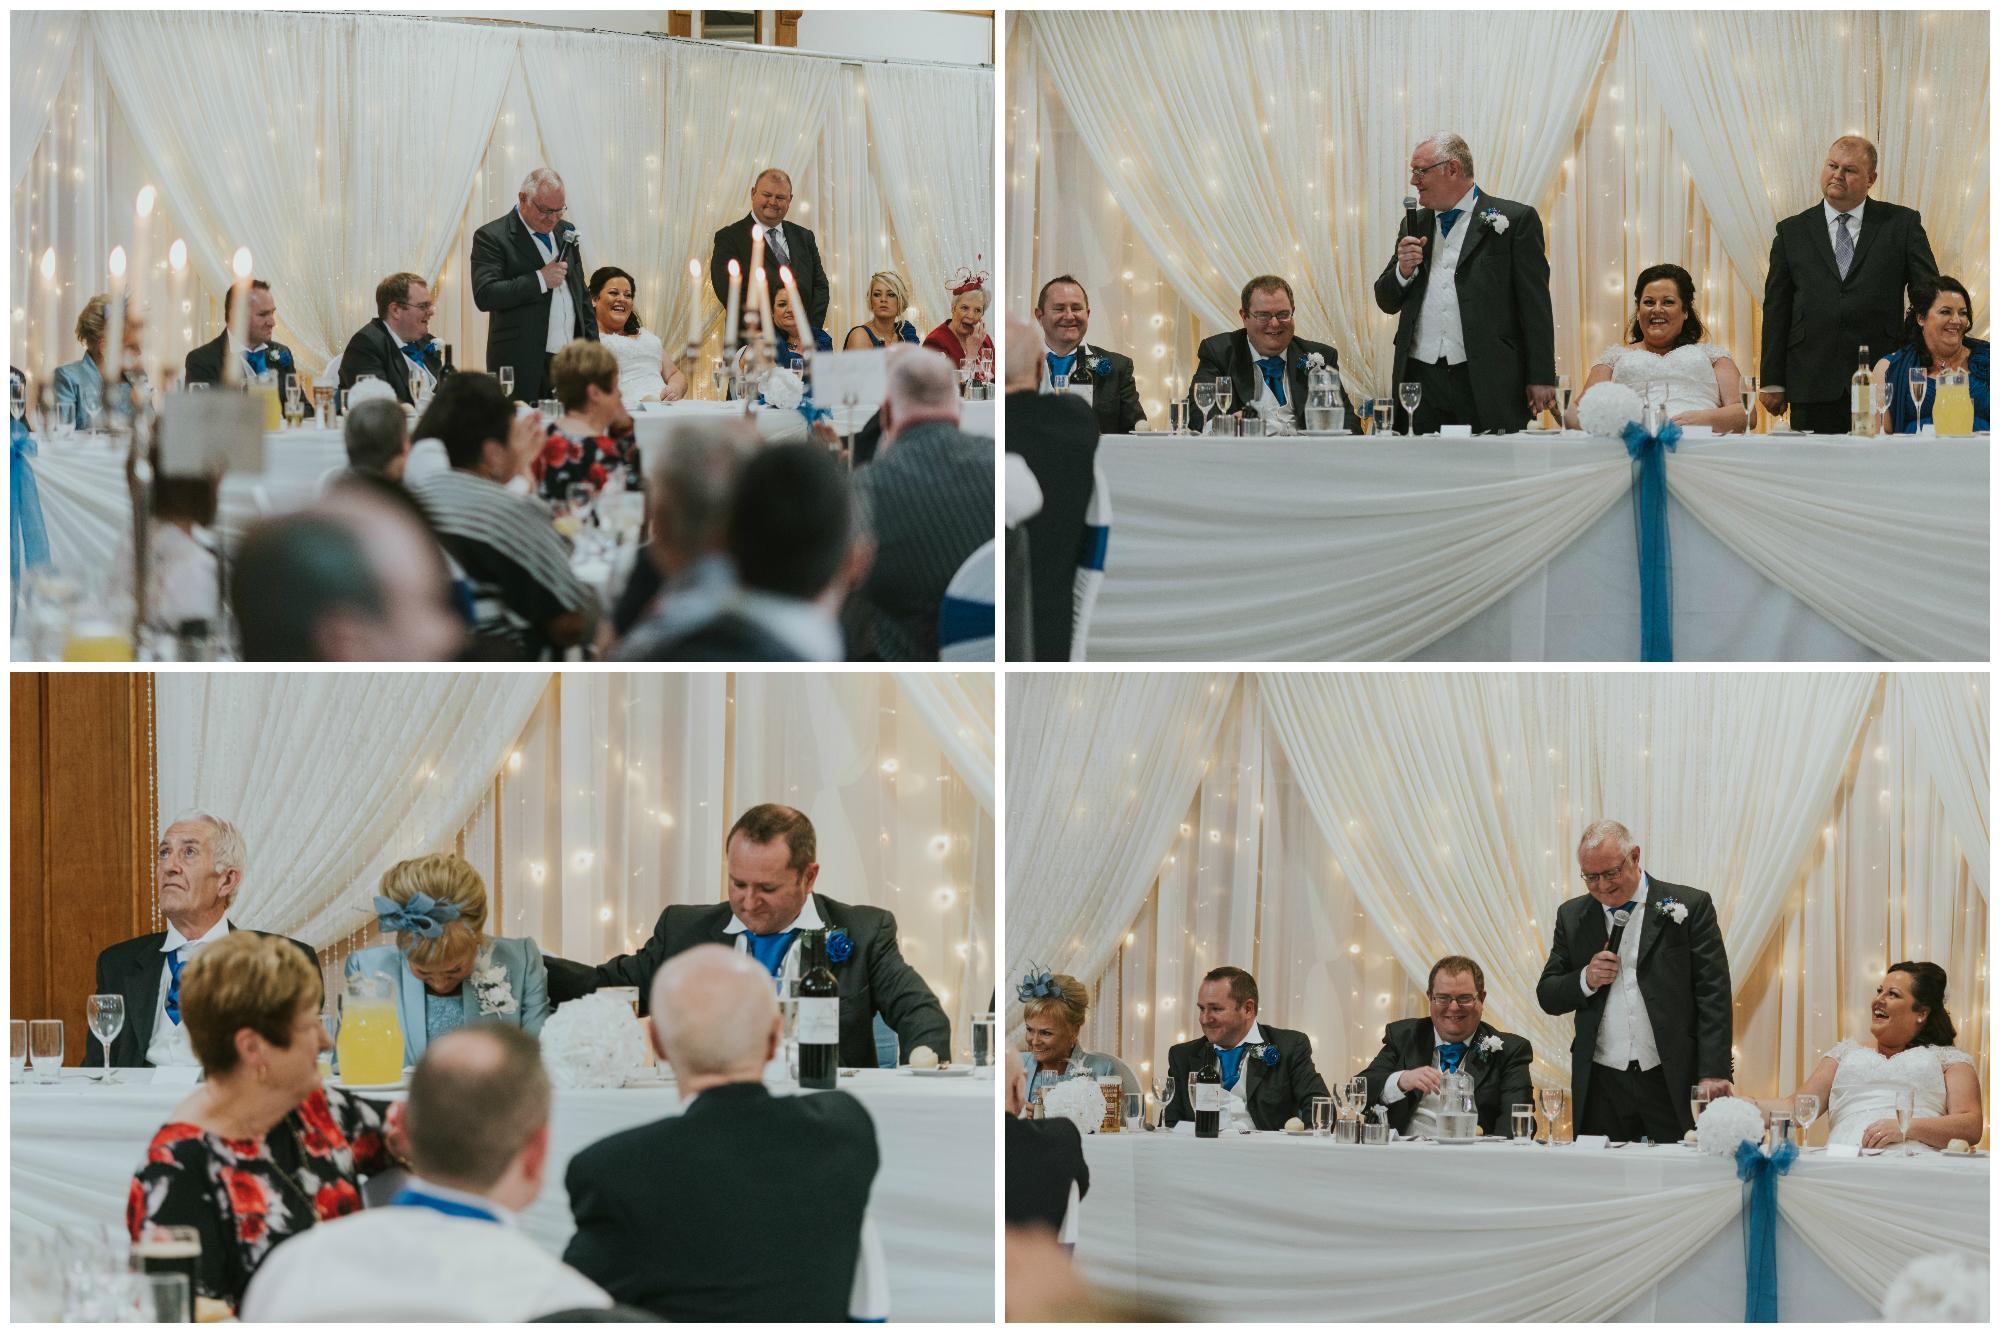 Balmoral Hotel Belfast wedding photographer Pure Photo N.I grooms speech